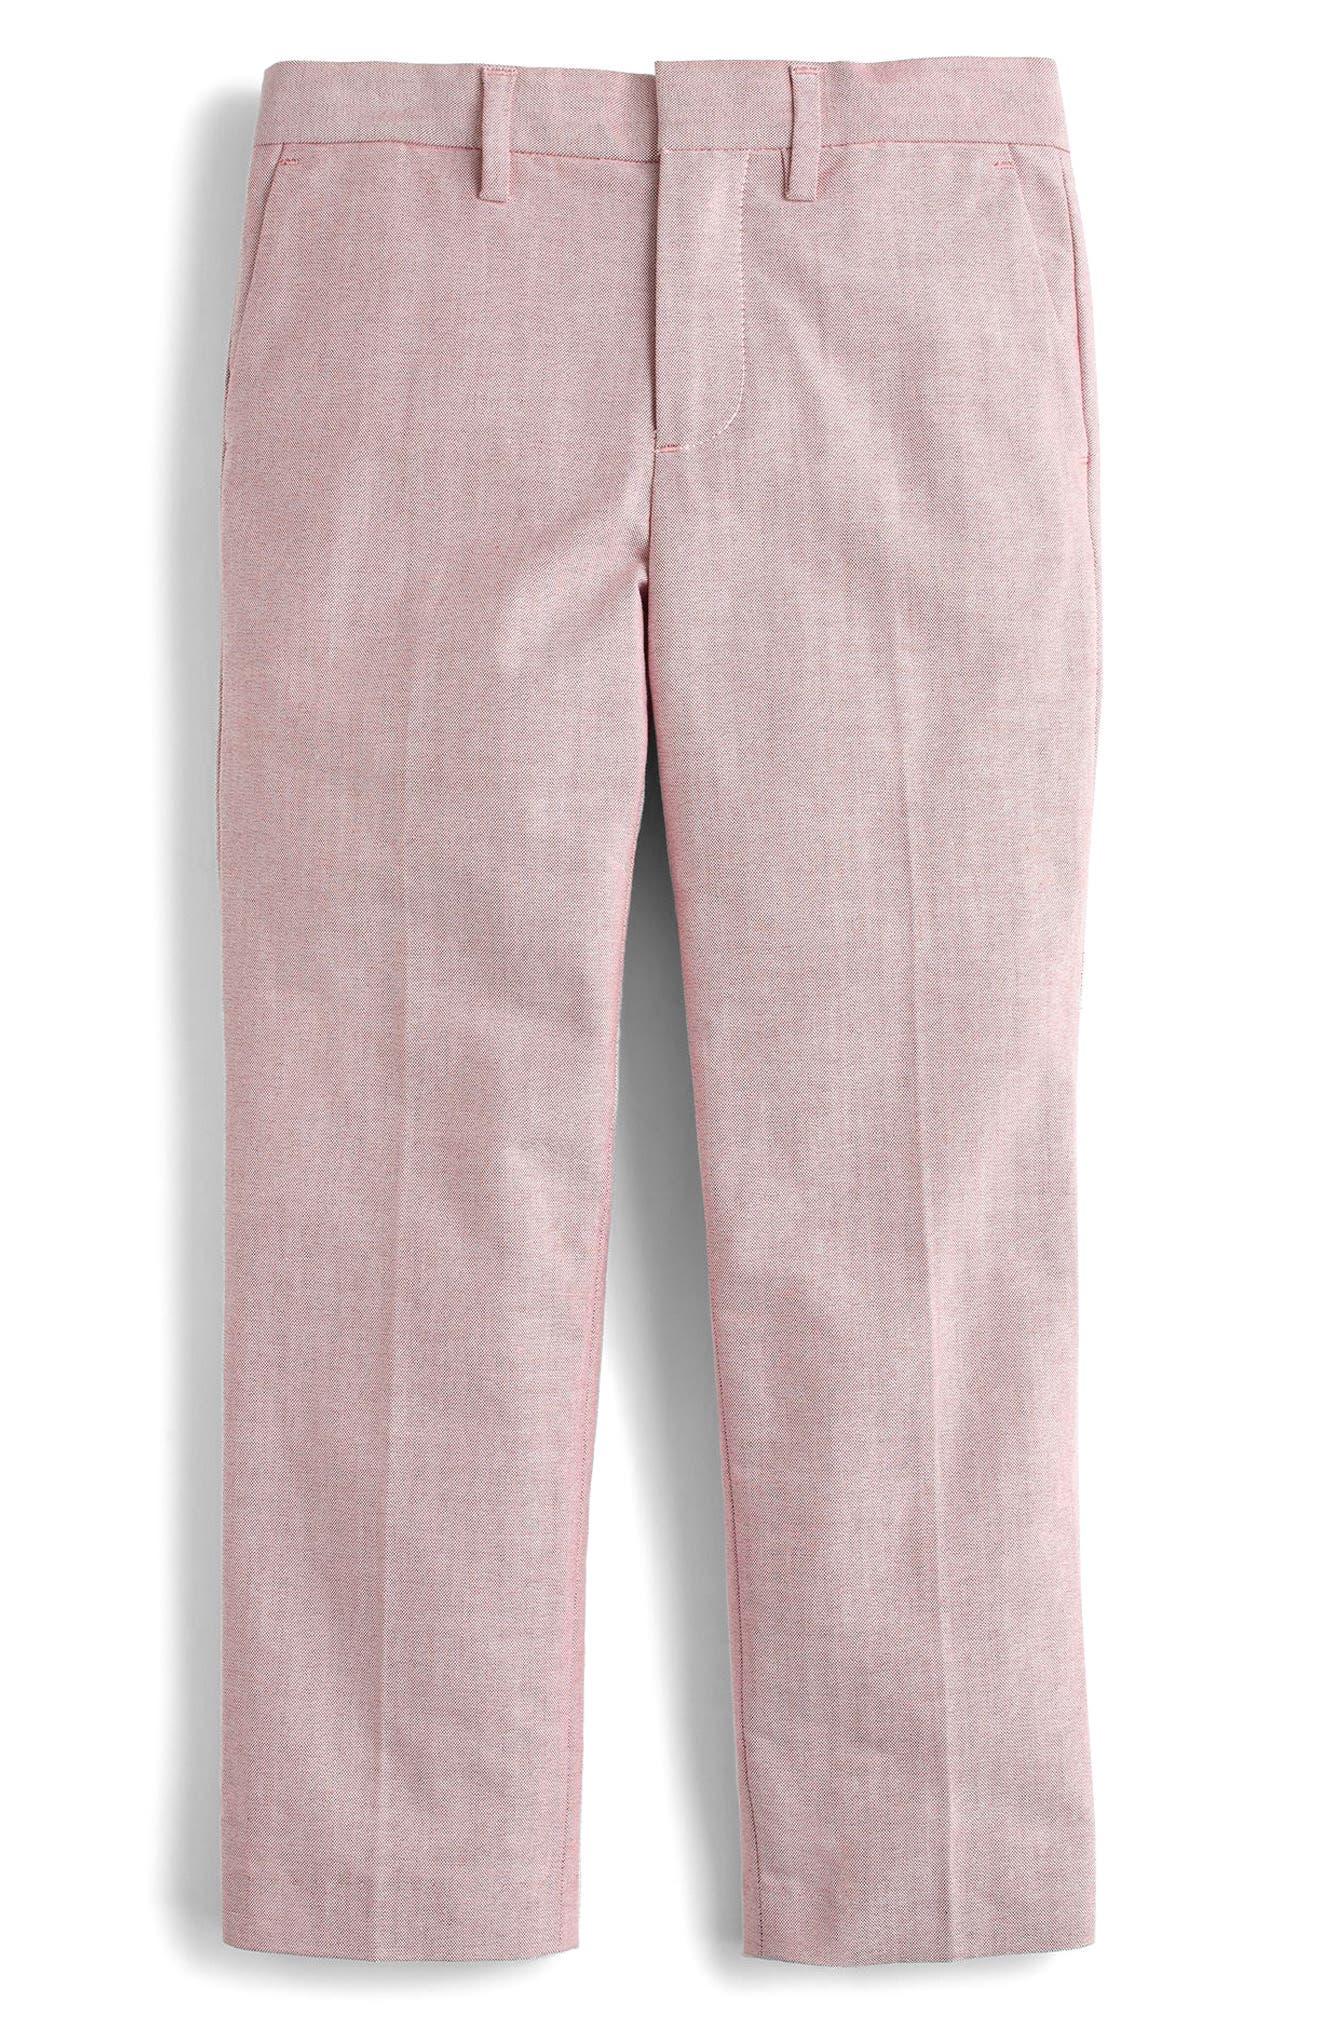 CREWCUTS BY J.CREW Ludlow Stretch Oxford Suit Pants, Main, color, 600